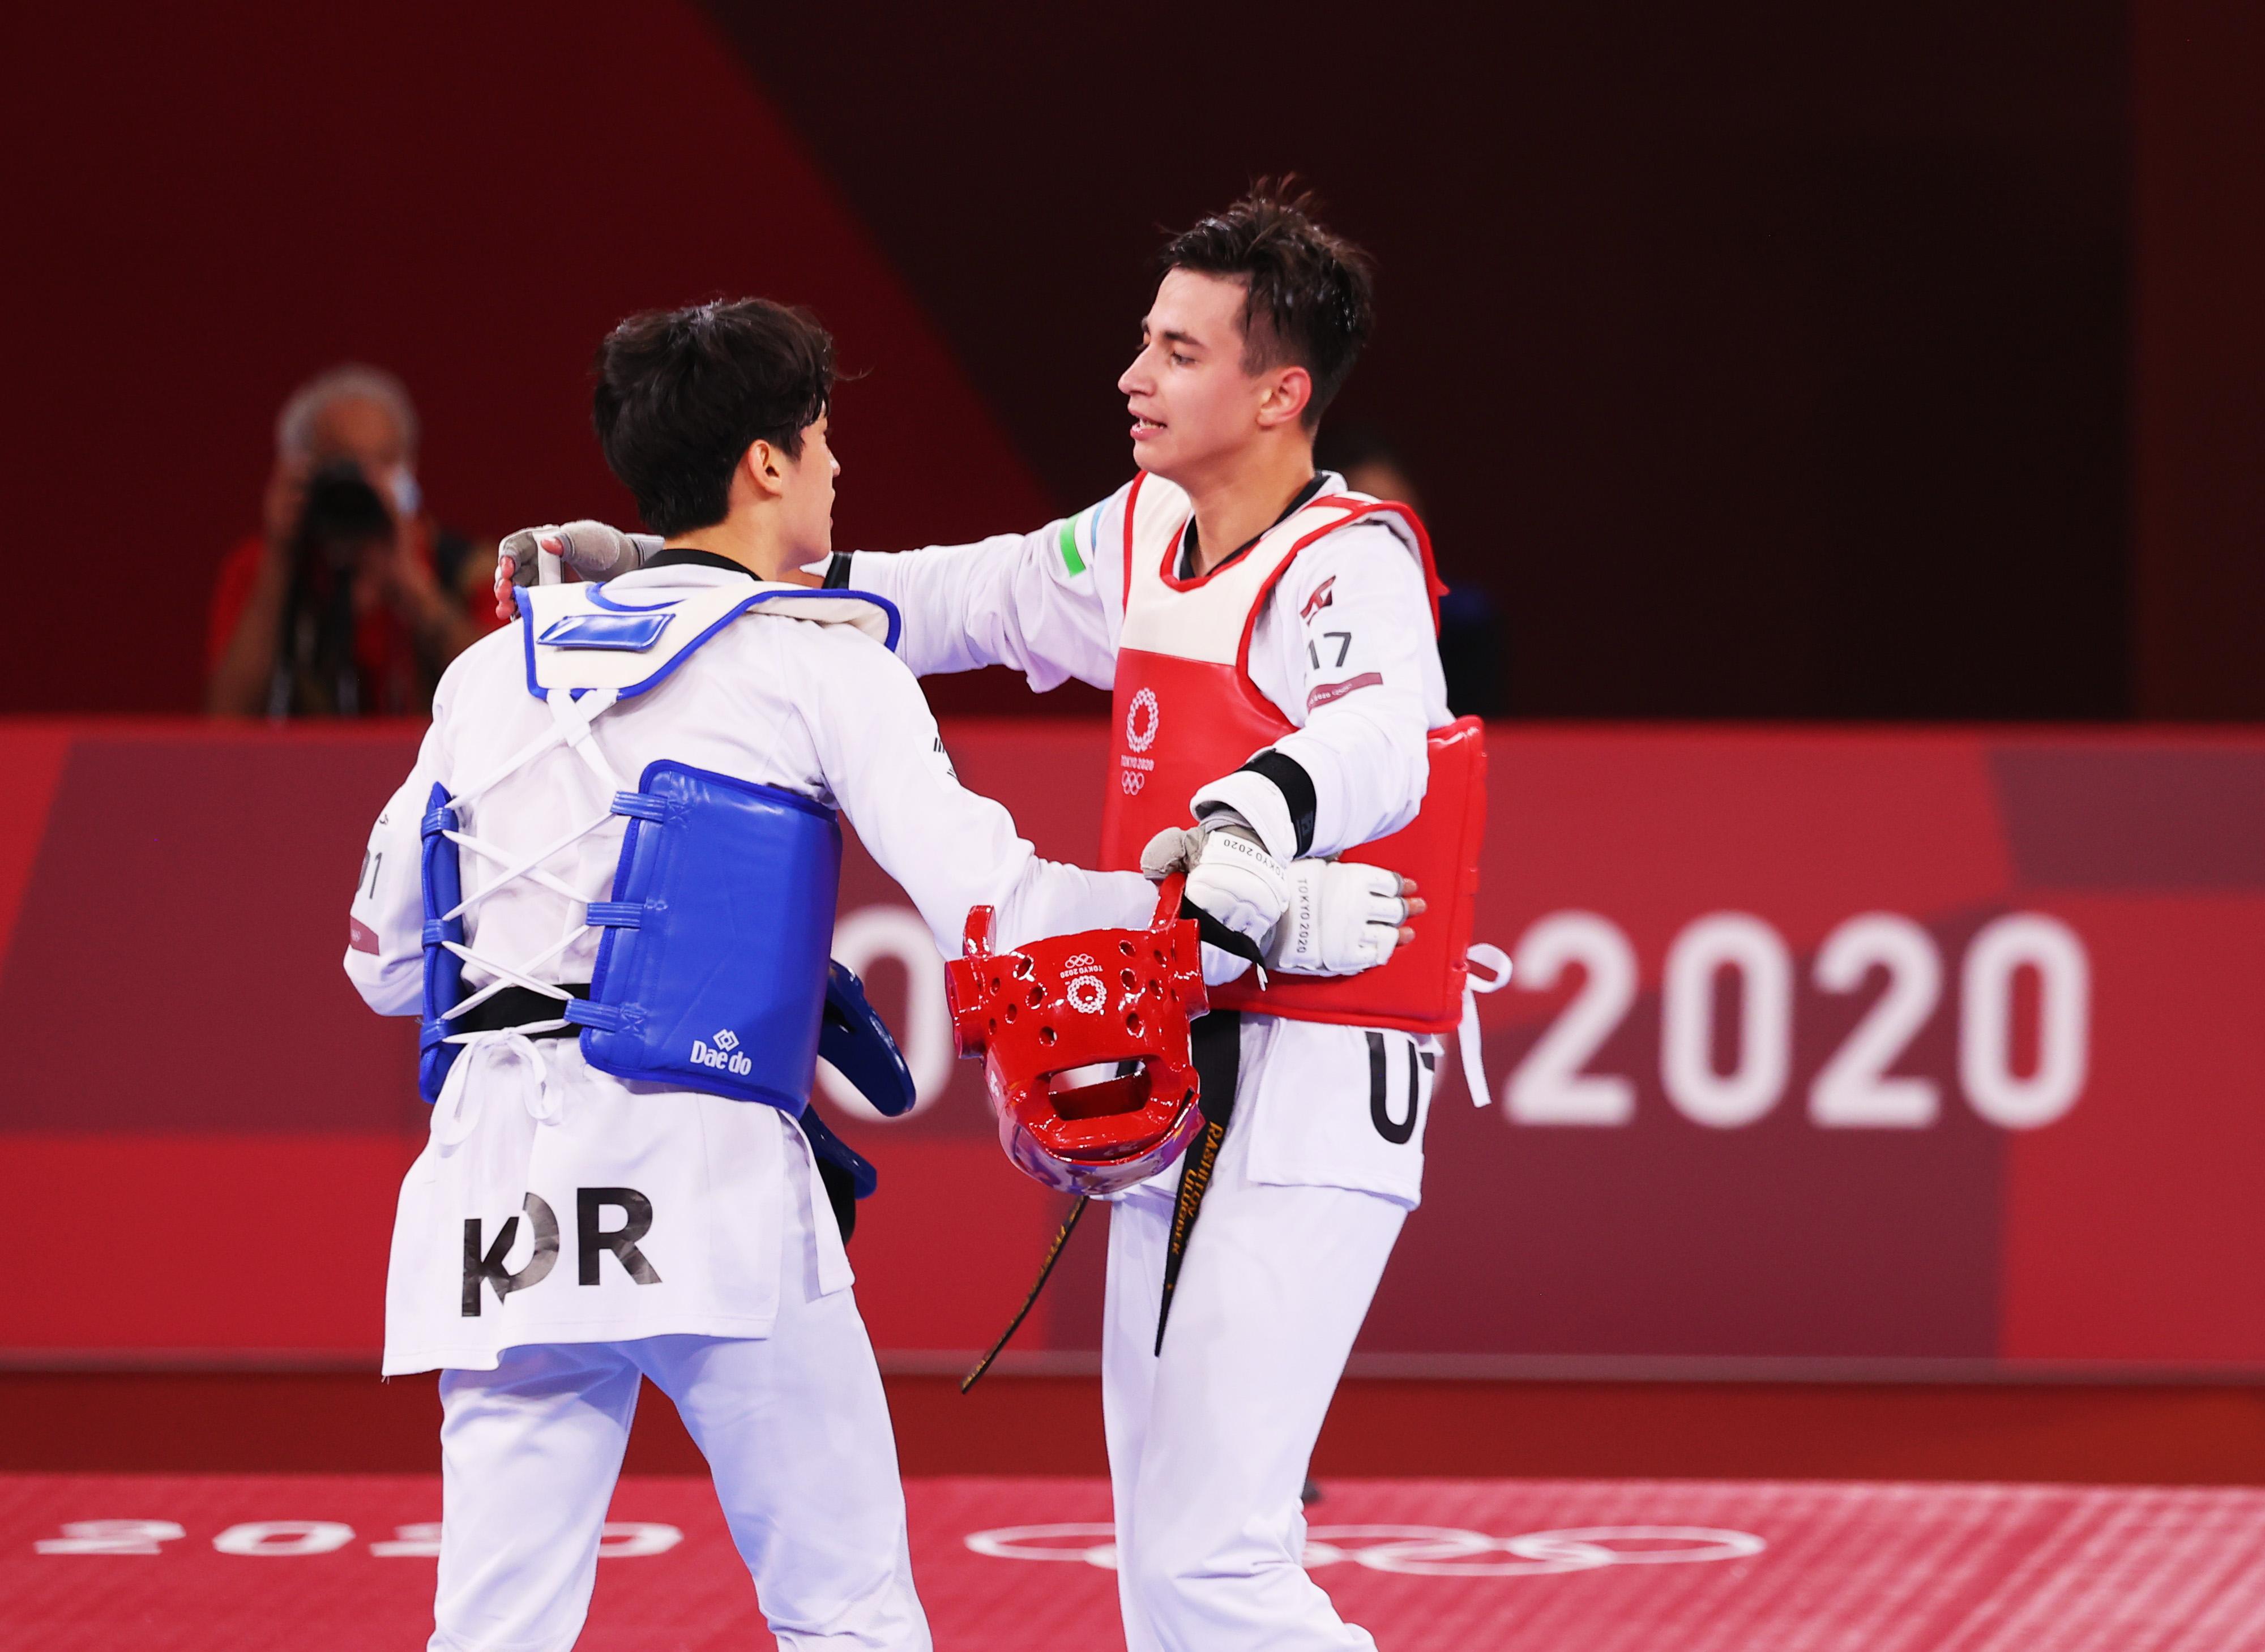 Tokyo 2020 Olympics - Taekwondo - Men's Featherweight 58-68kg - Last 16 - Makuhari Messe Hall A, Chiba, Japan - July 25, 2021. Ulugbek Rashitov of Uzbekistan and Lee Dae-Hoon of South Korea embrace after competing REUTERS/Murad Sezer